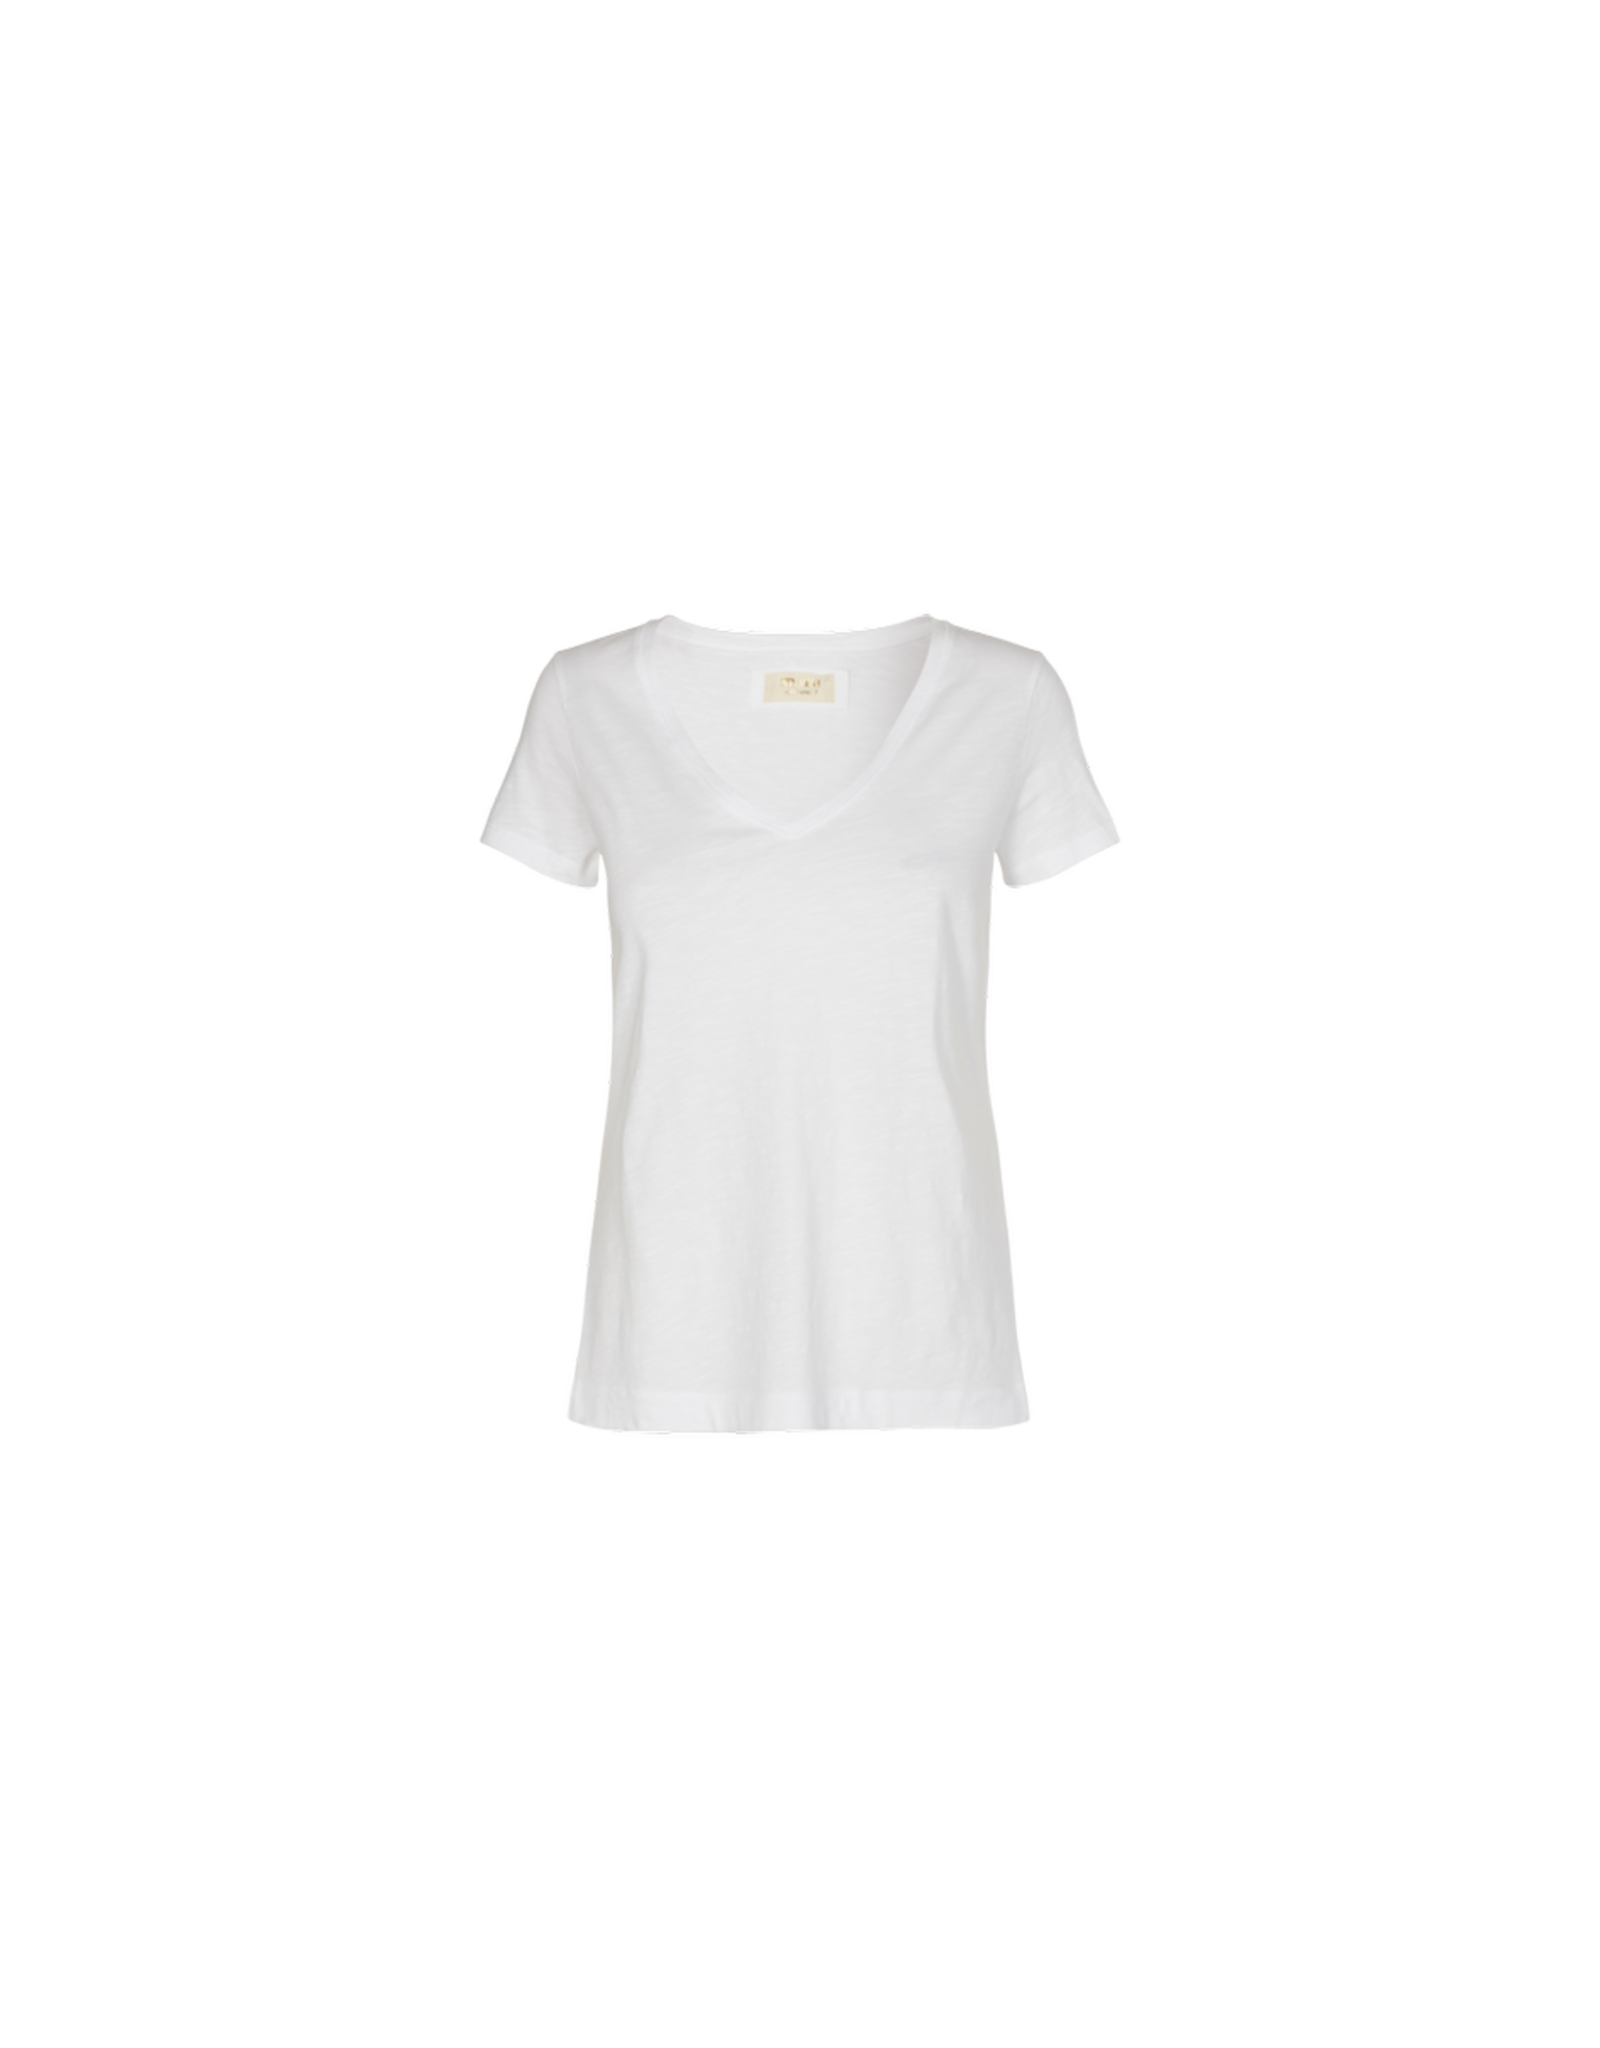 Mos Mosh Arden Organic V-Neck T-Shirt